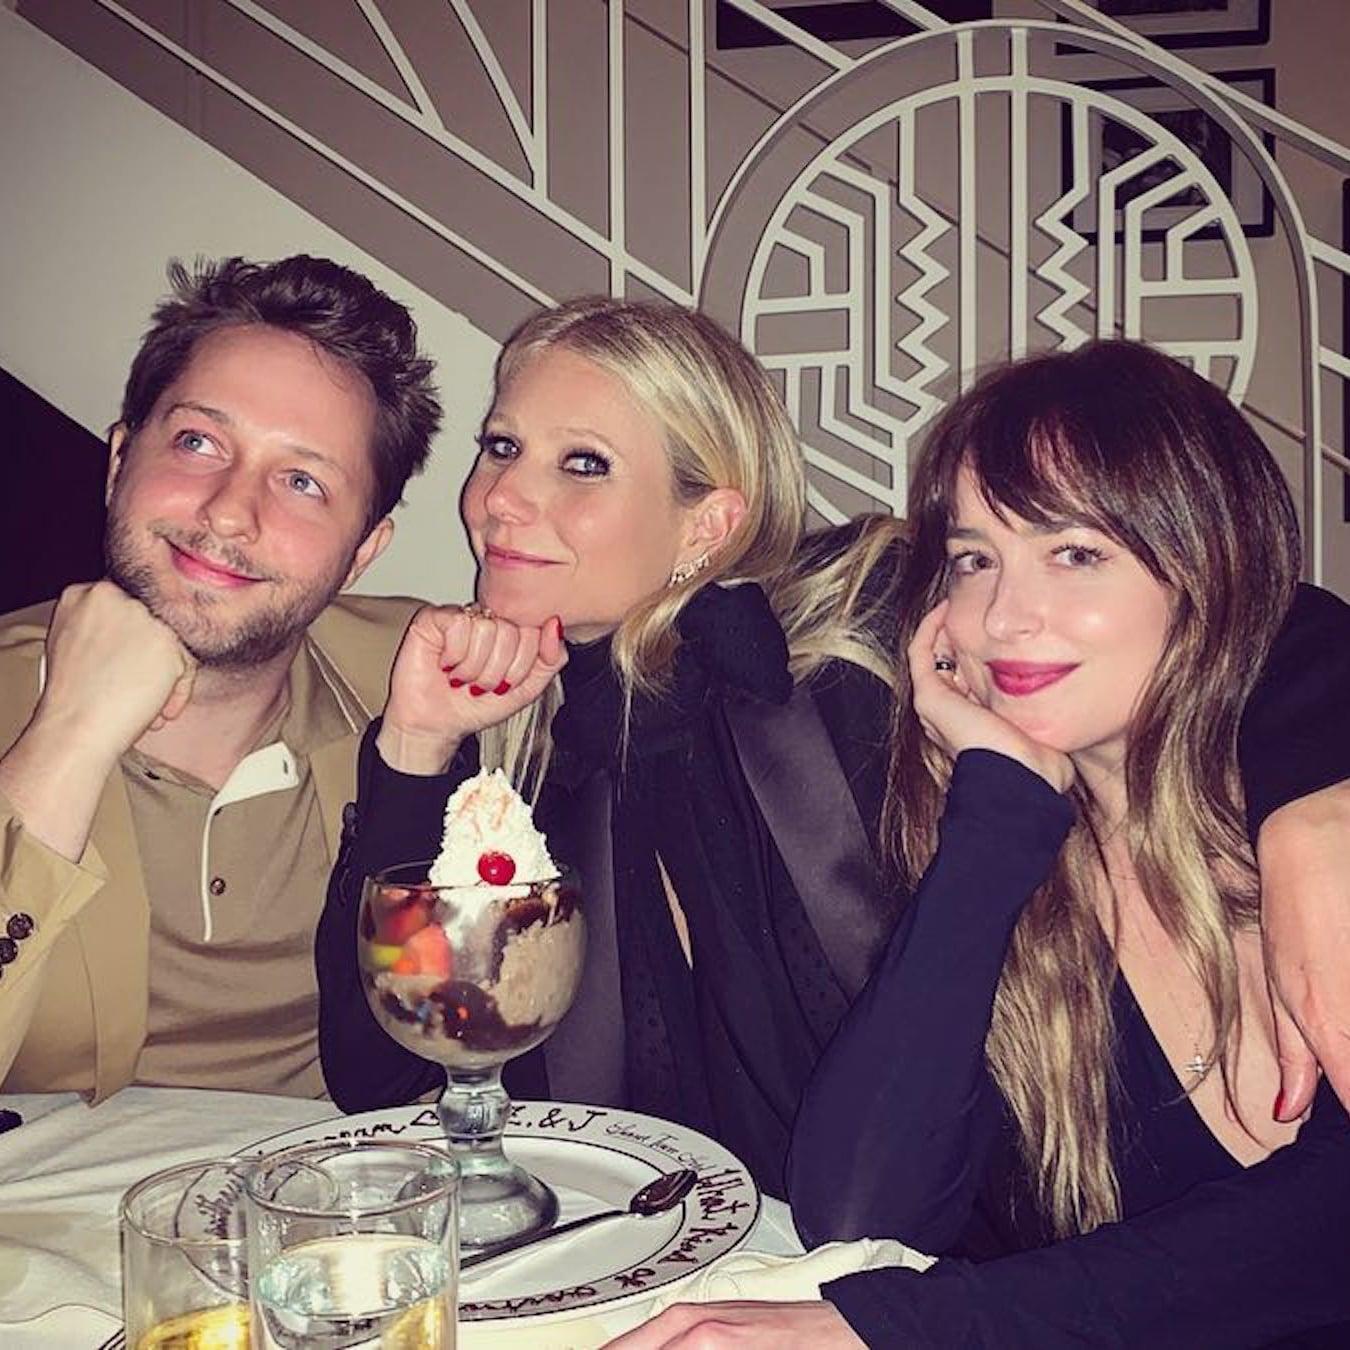 Gwyneth Paltrow and Dakota Johnson at Party April 2019 | POPSUGAR Celebrity UK